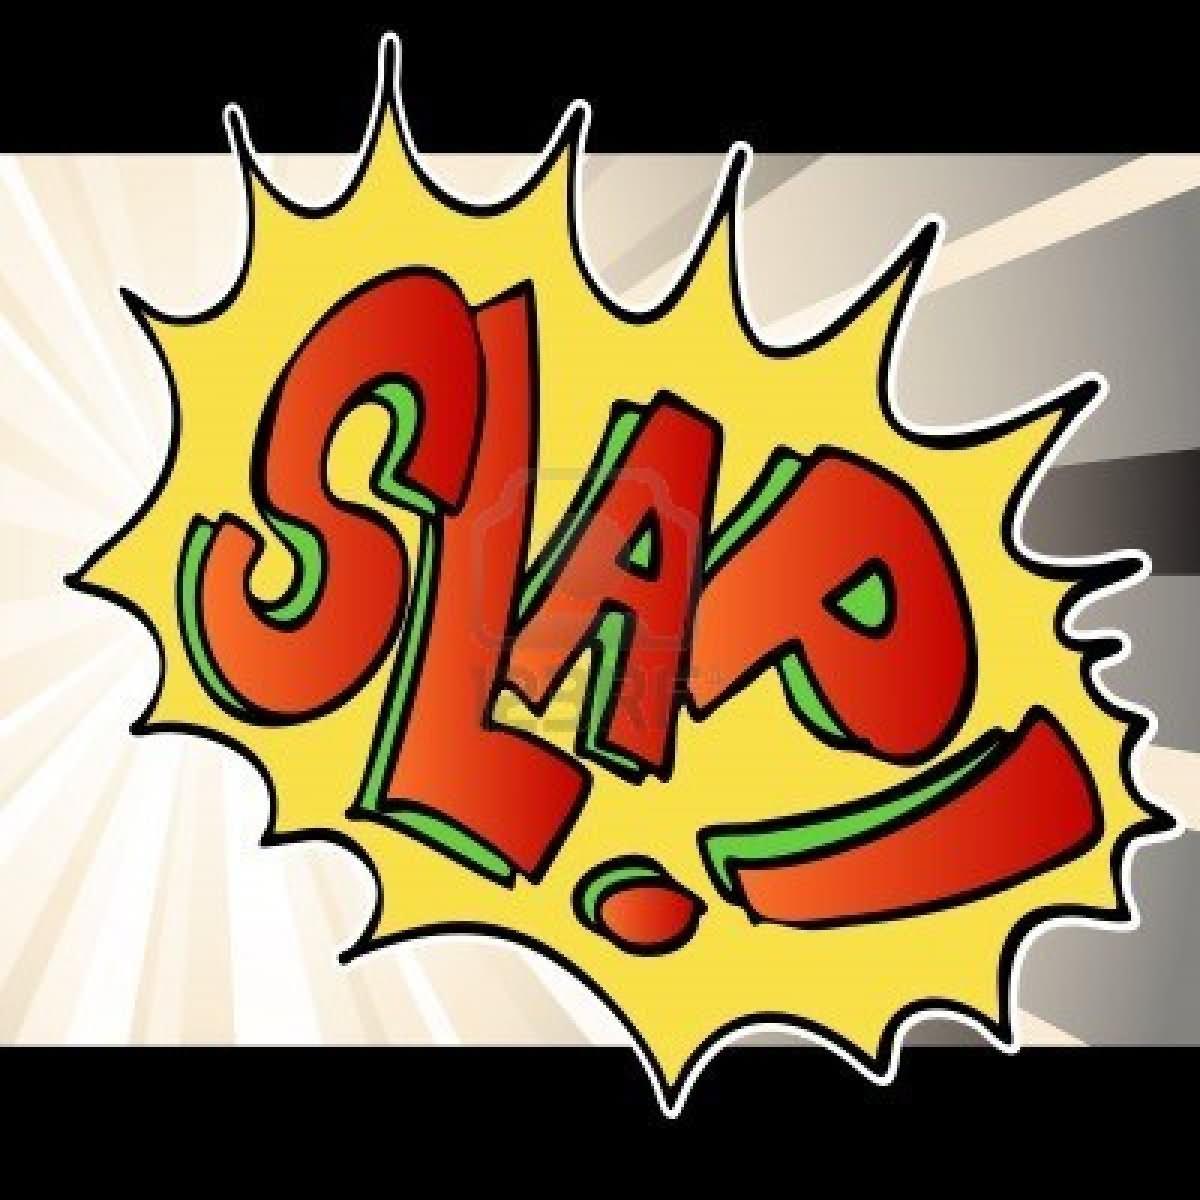 3 Happy Slap Day